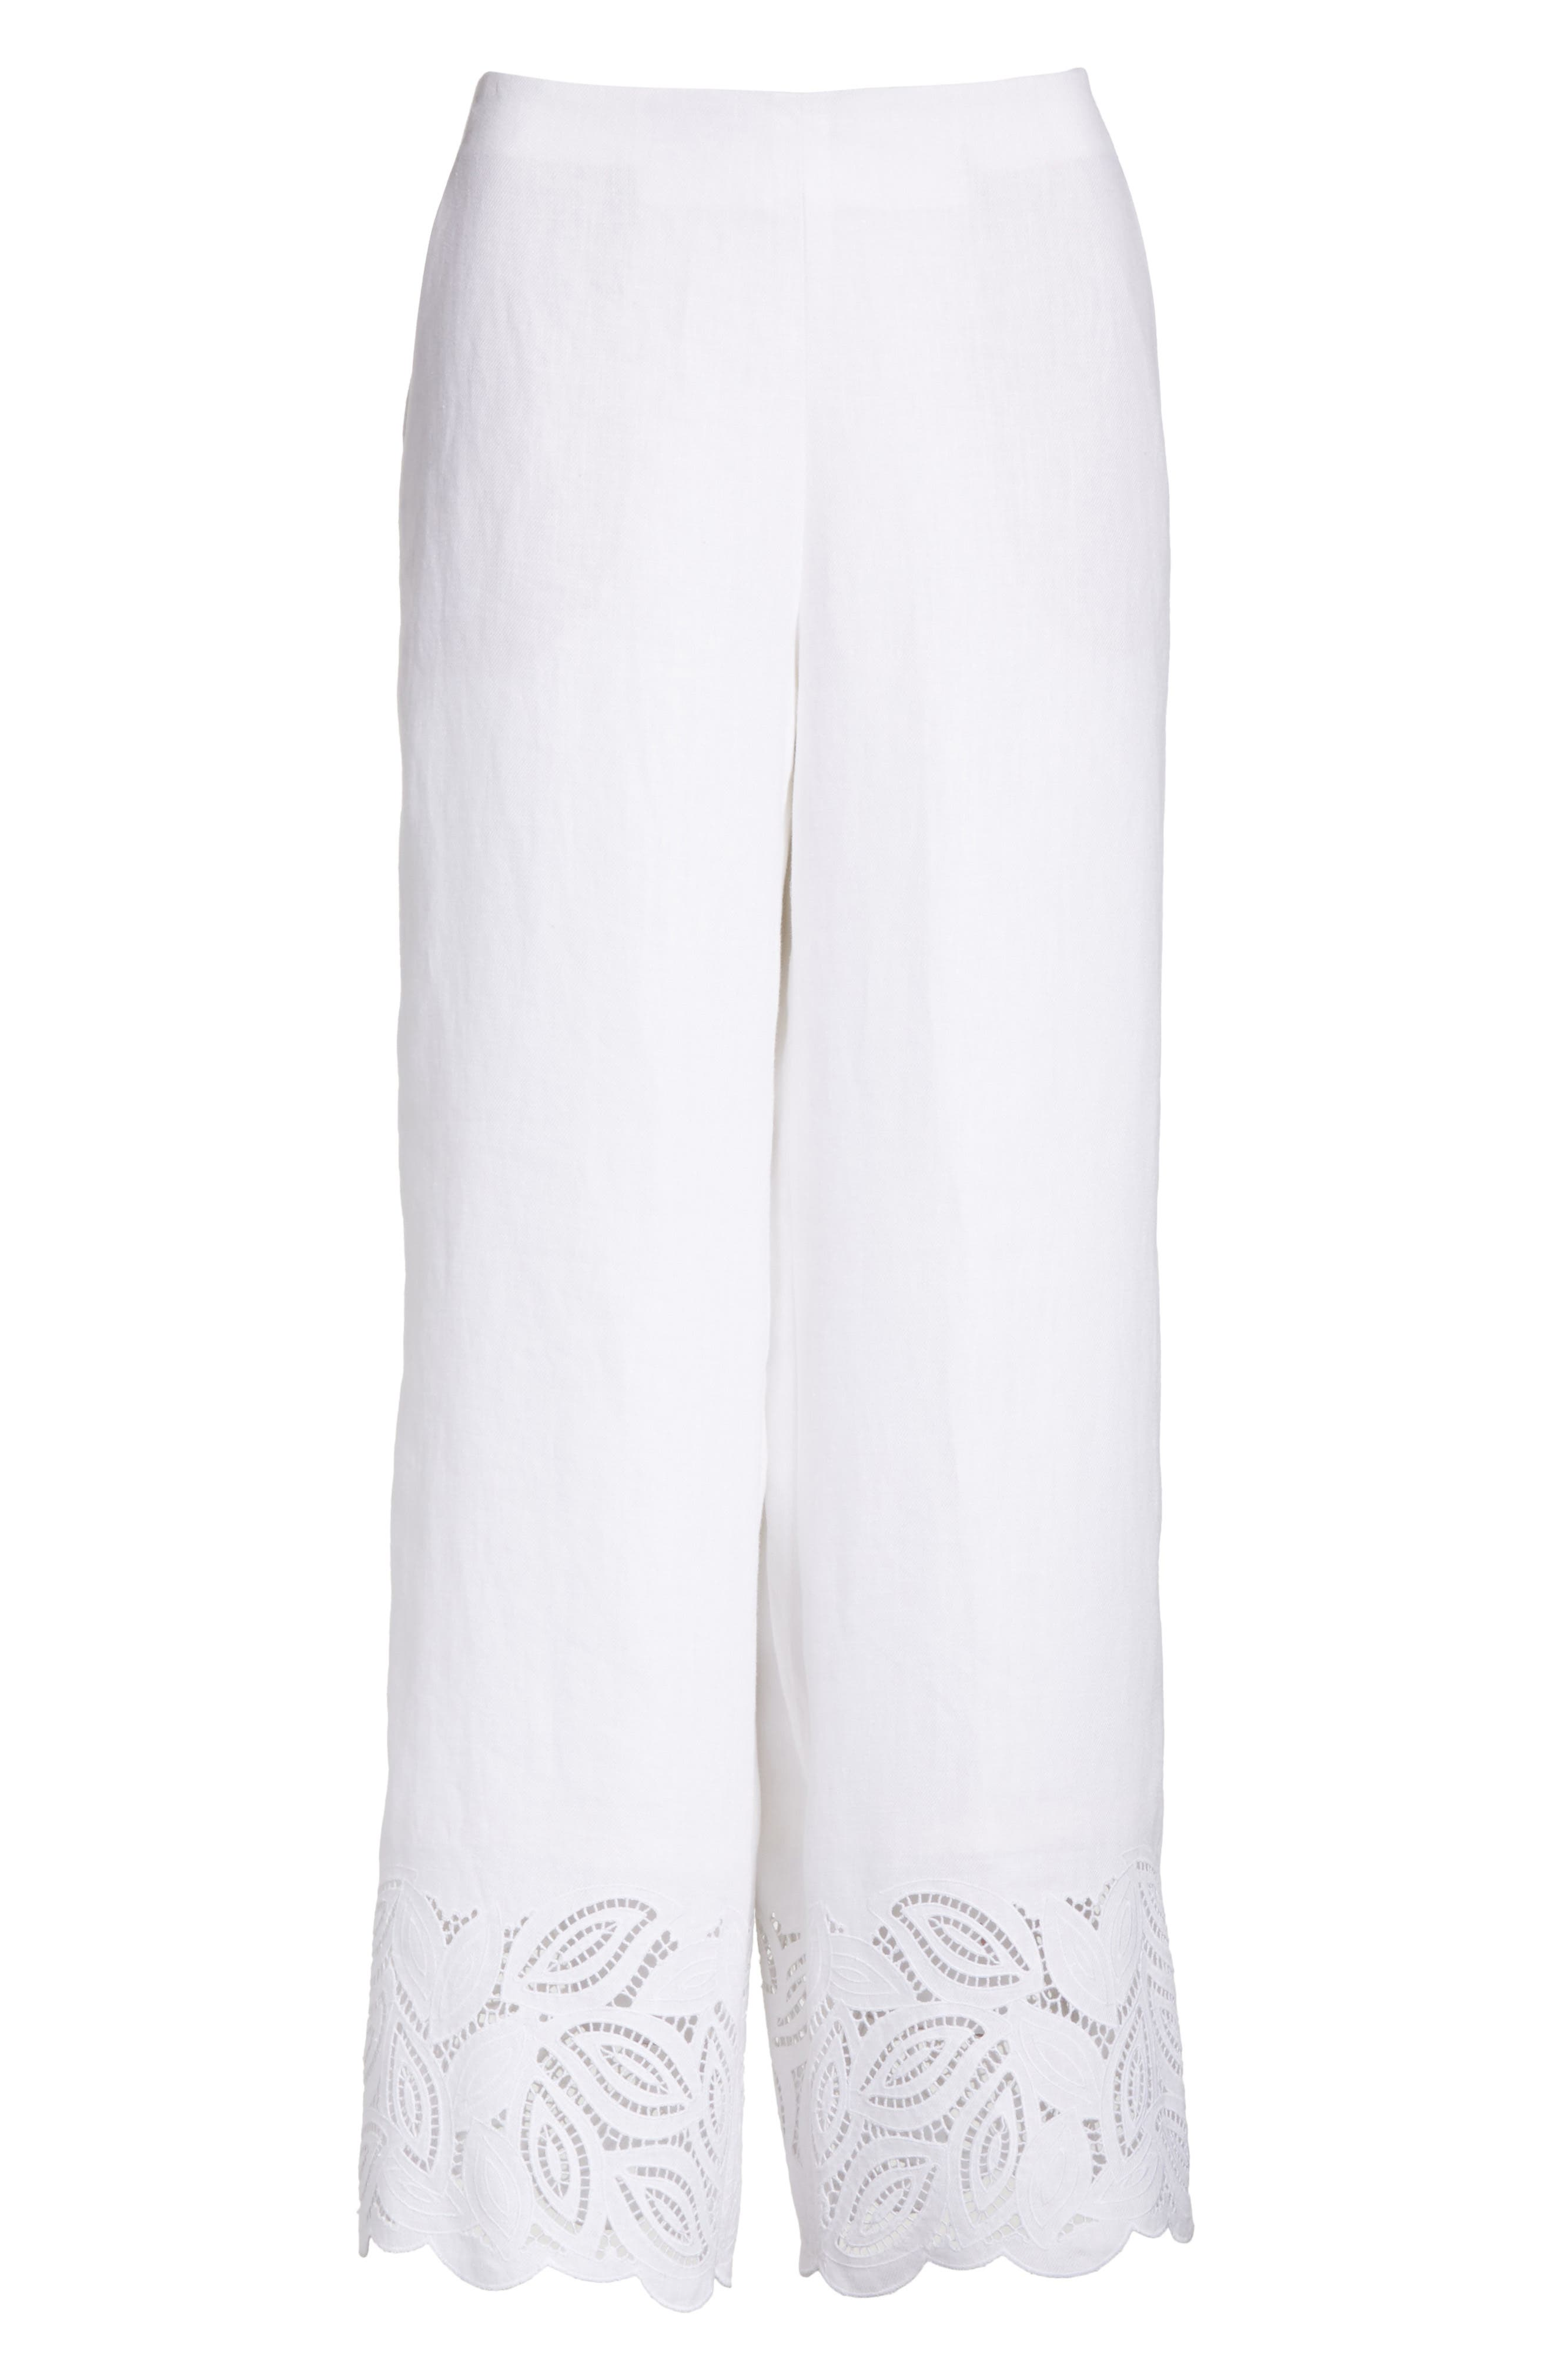 Morton Embroidered Pants,                             Alternate thumbnail 6, color,                             100